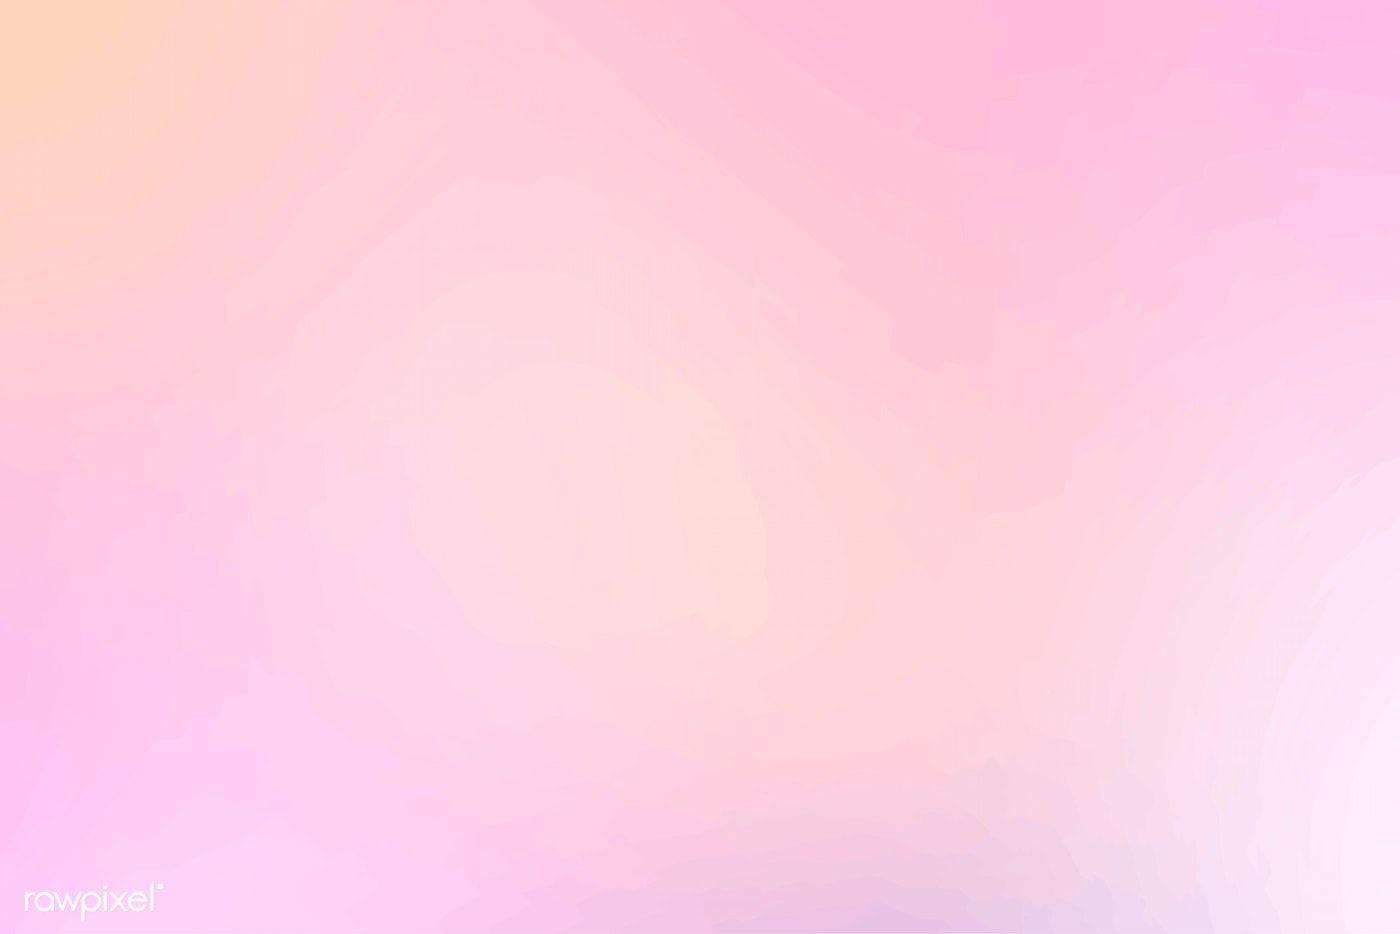 Download Premium Vector Of Pastel Pink And Orange Background Vector 597512 Pink Wallpaper Iphone Wallpaper Pink Background